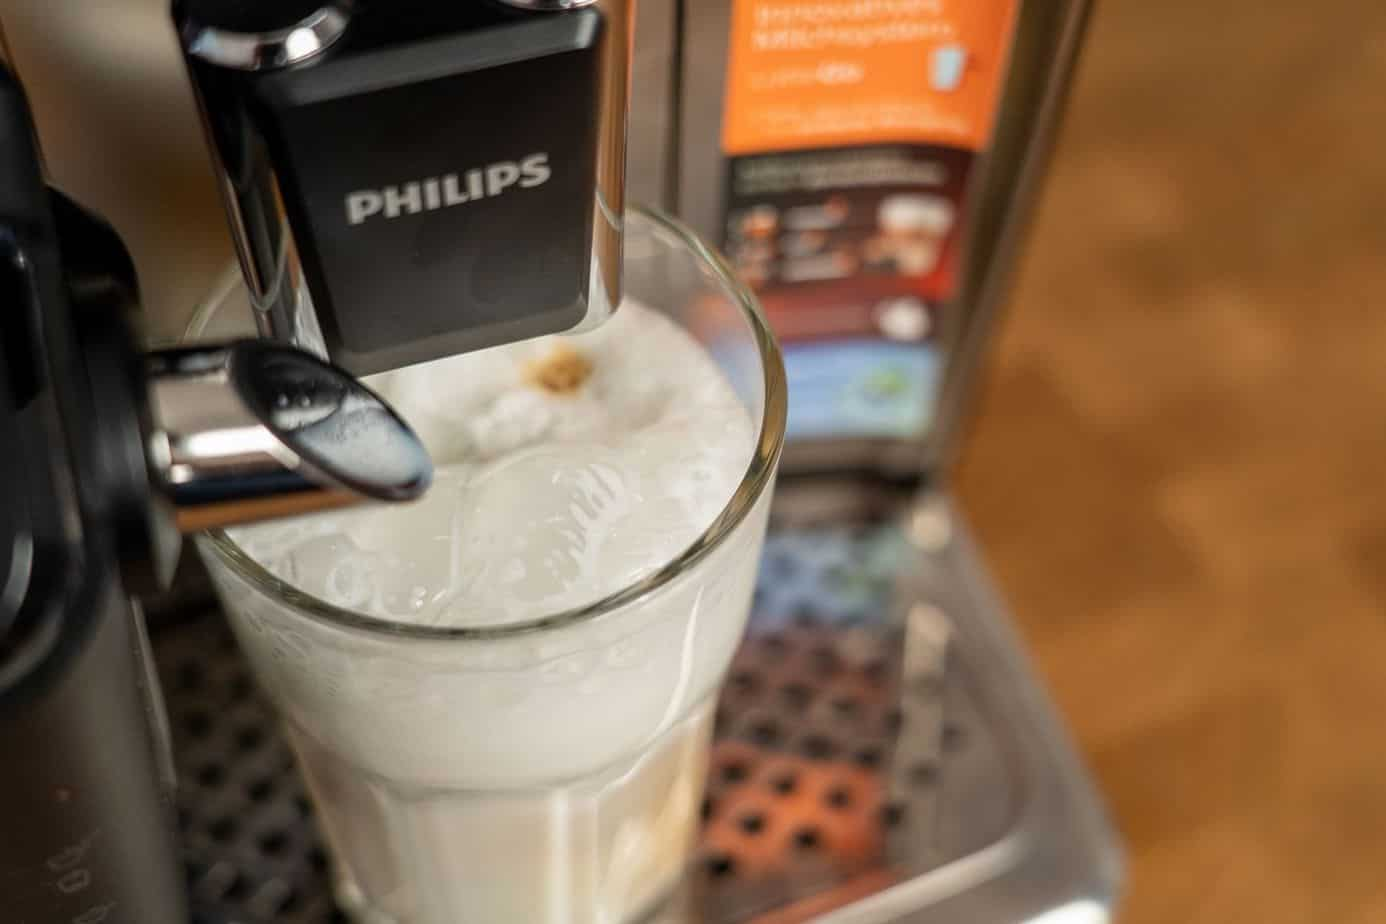 Philips EP5447 90 LatteGo Kaffeevollautomat Milchsystem